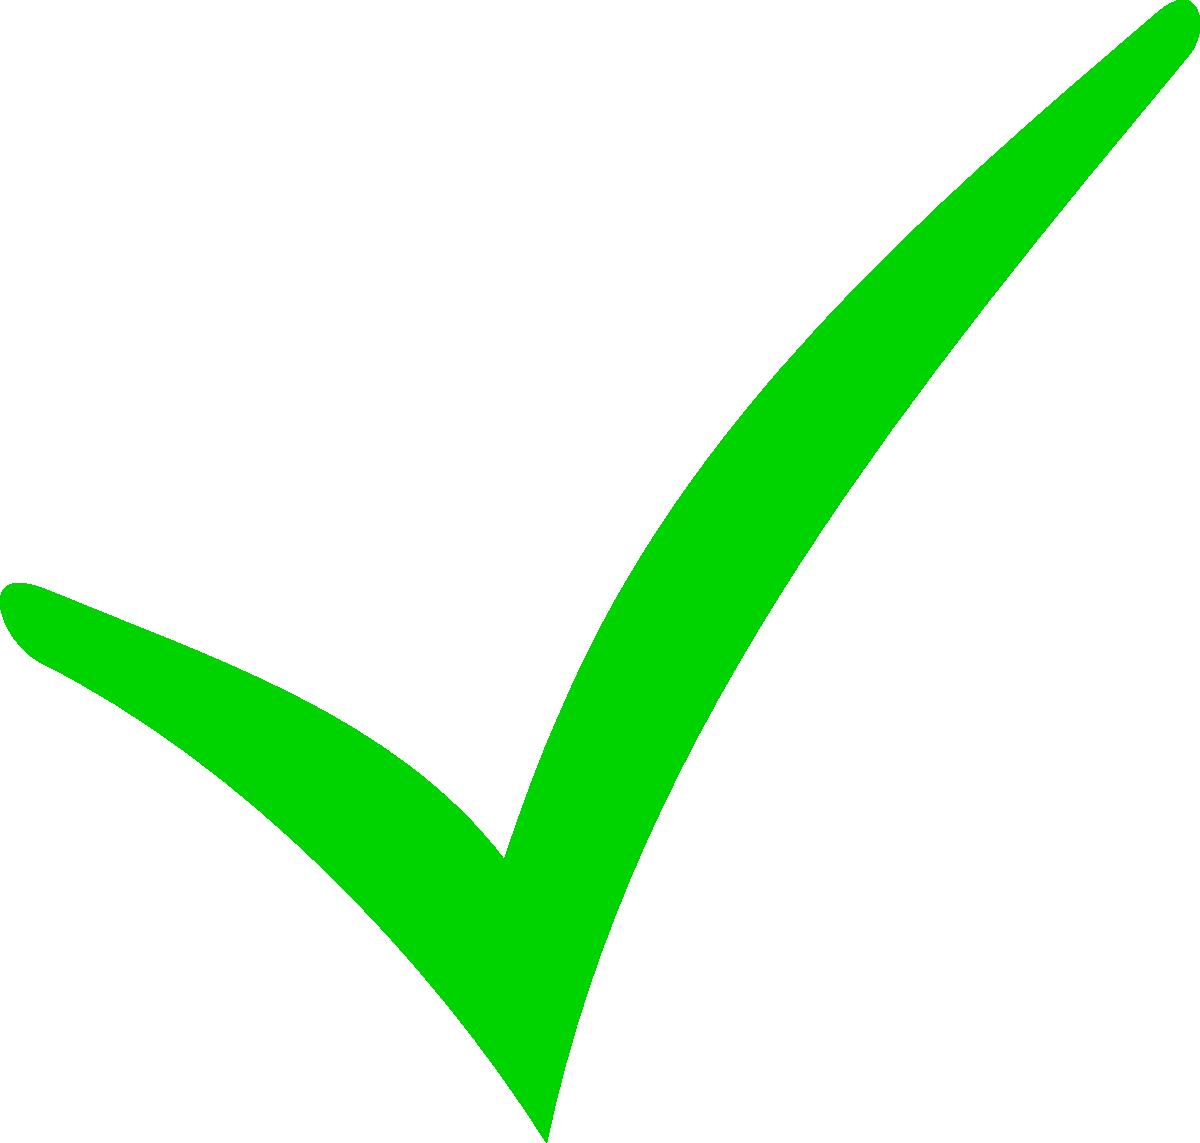 checkmark png clipart best clipart checkmark transparent clip art checkmarks